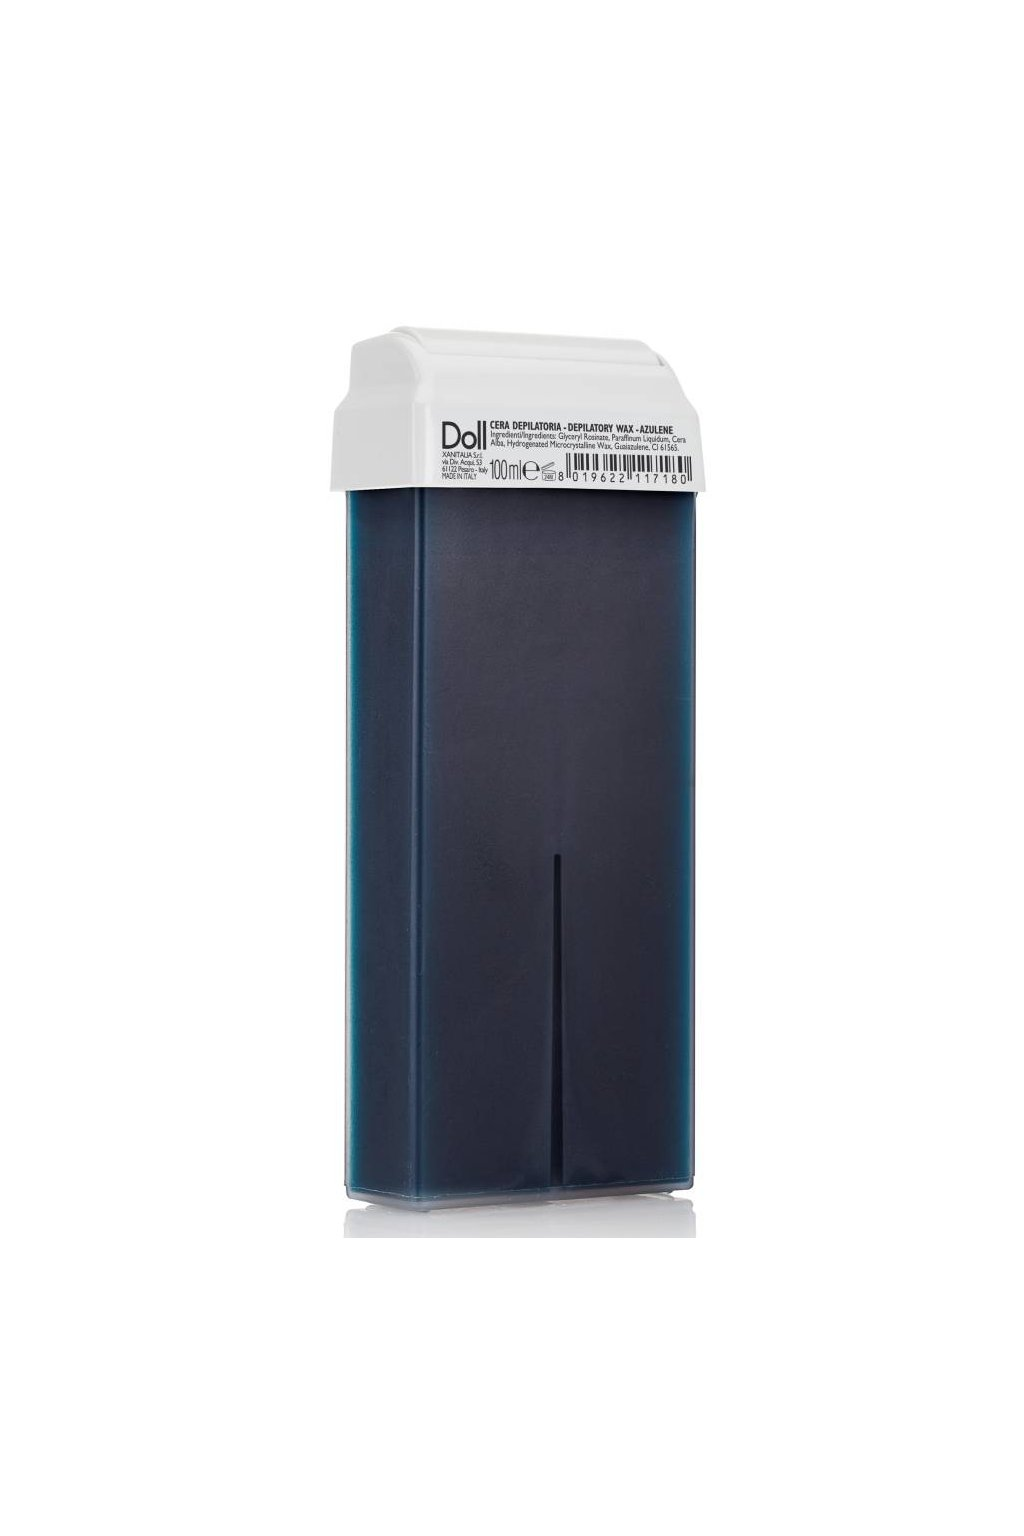 8114 1 xanitalia epilacni vosk azulene s rostlinnymi oleji hermanku s roll on hlavici 100ml